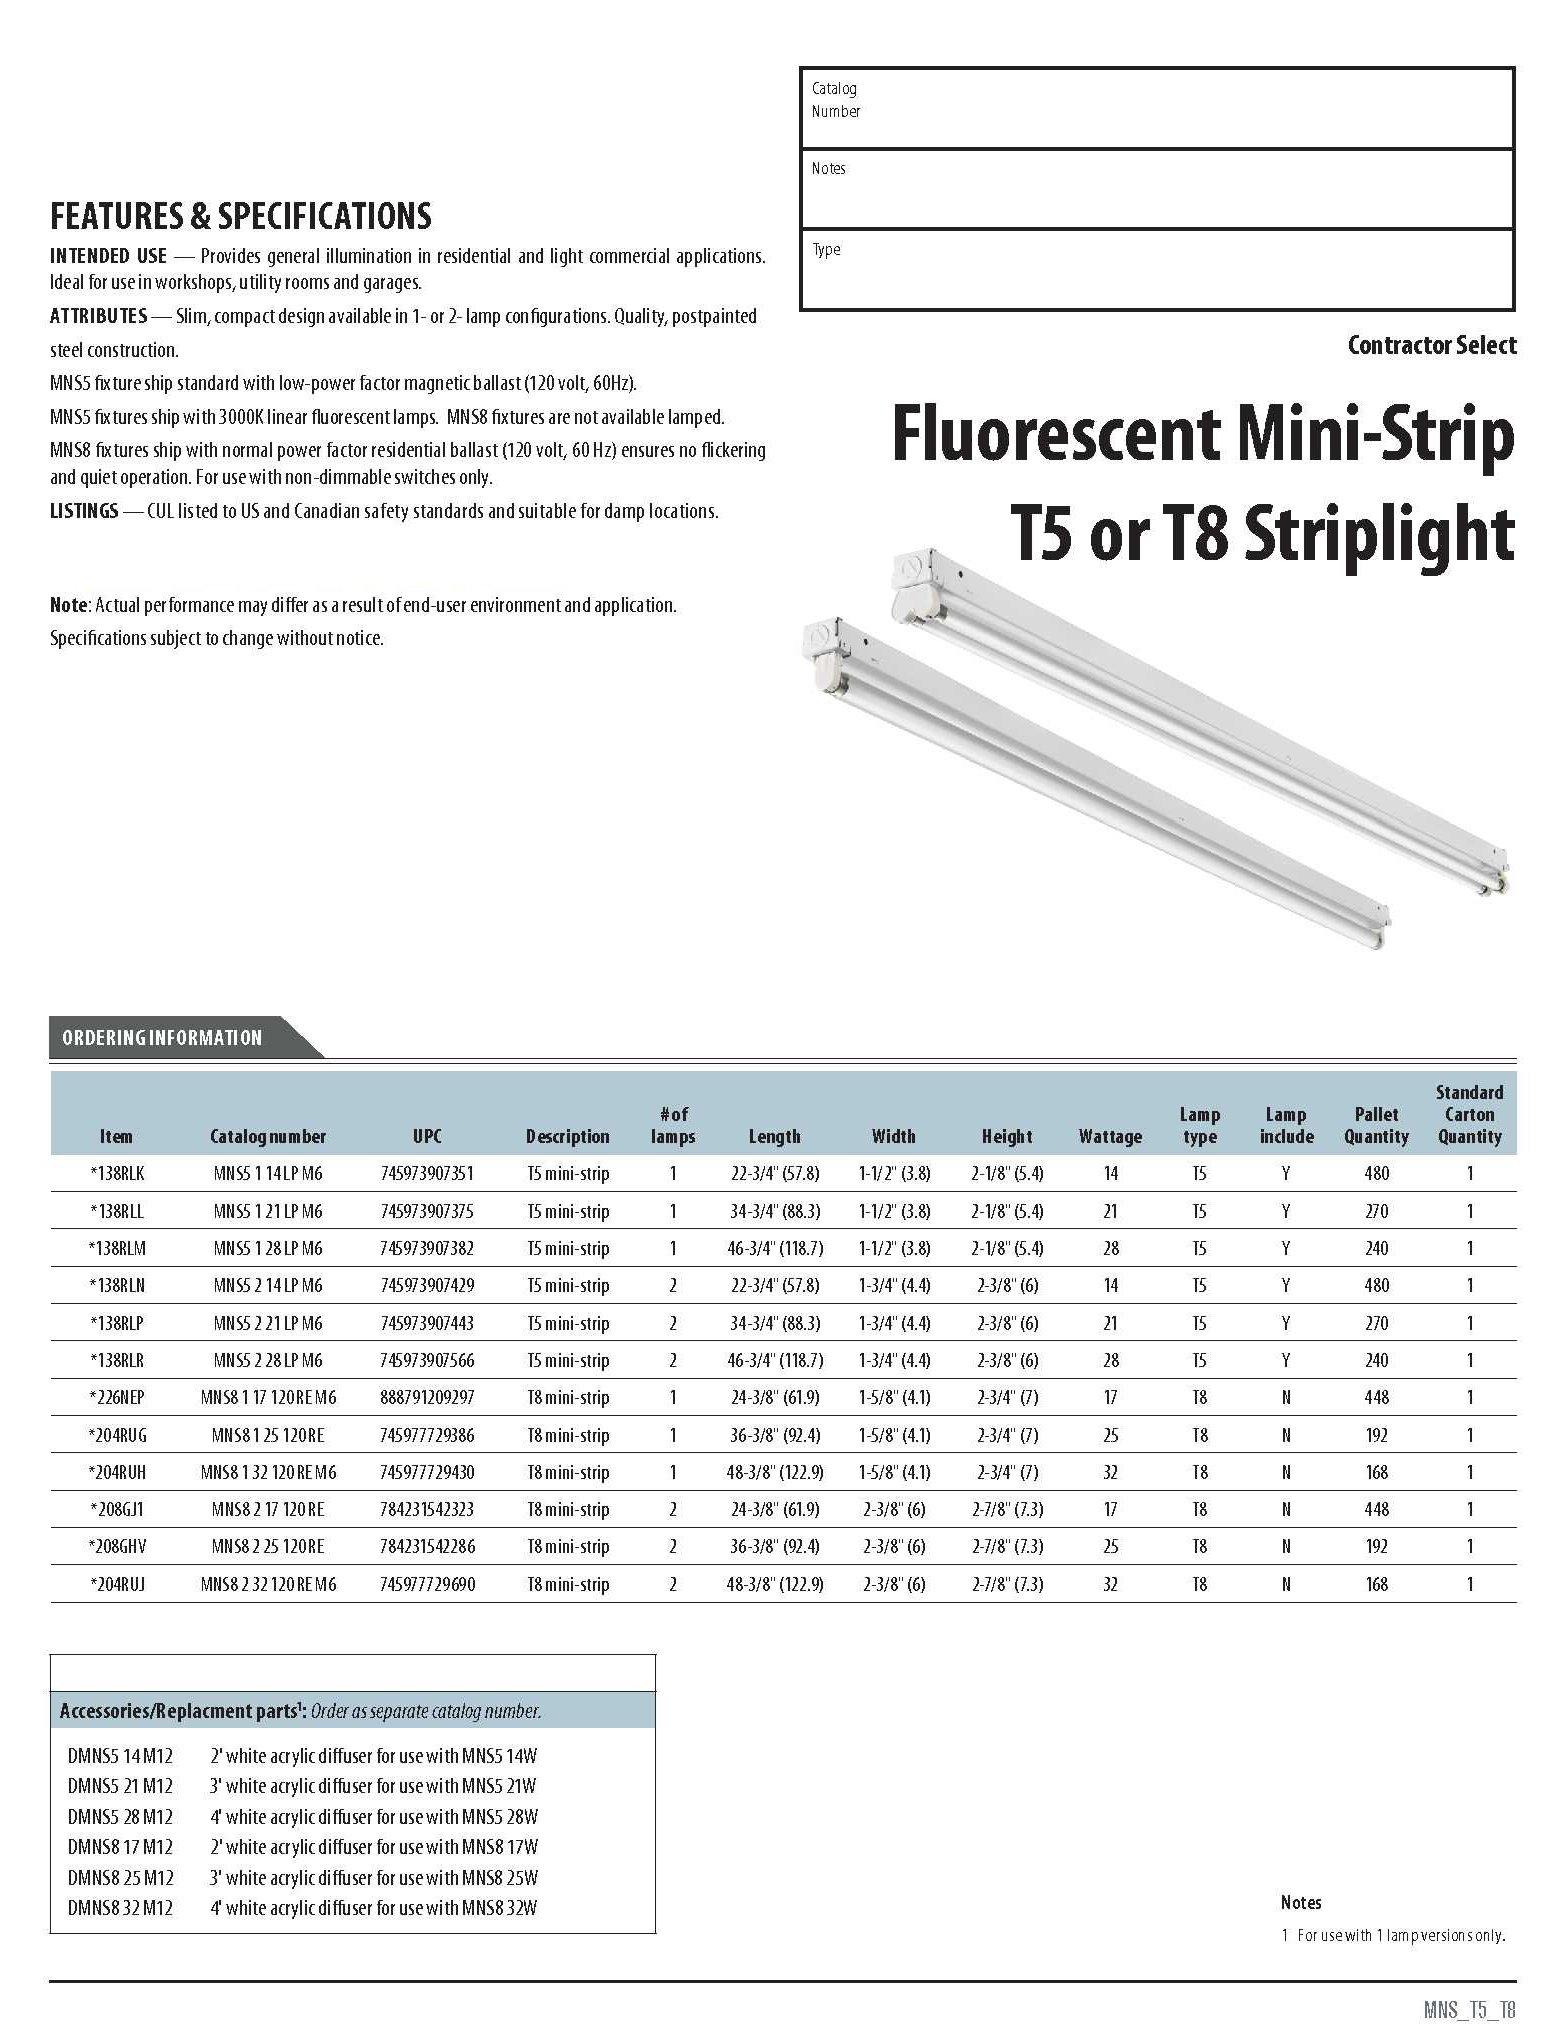 Lithonia Lighting MNS5 2 14 LP M6 4' 2 Light 32W T8 Fluorescent Square Basket Wraparound, White, 2'